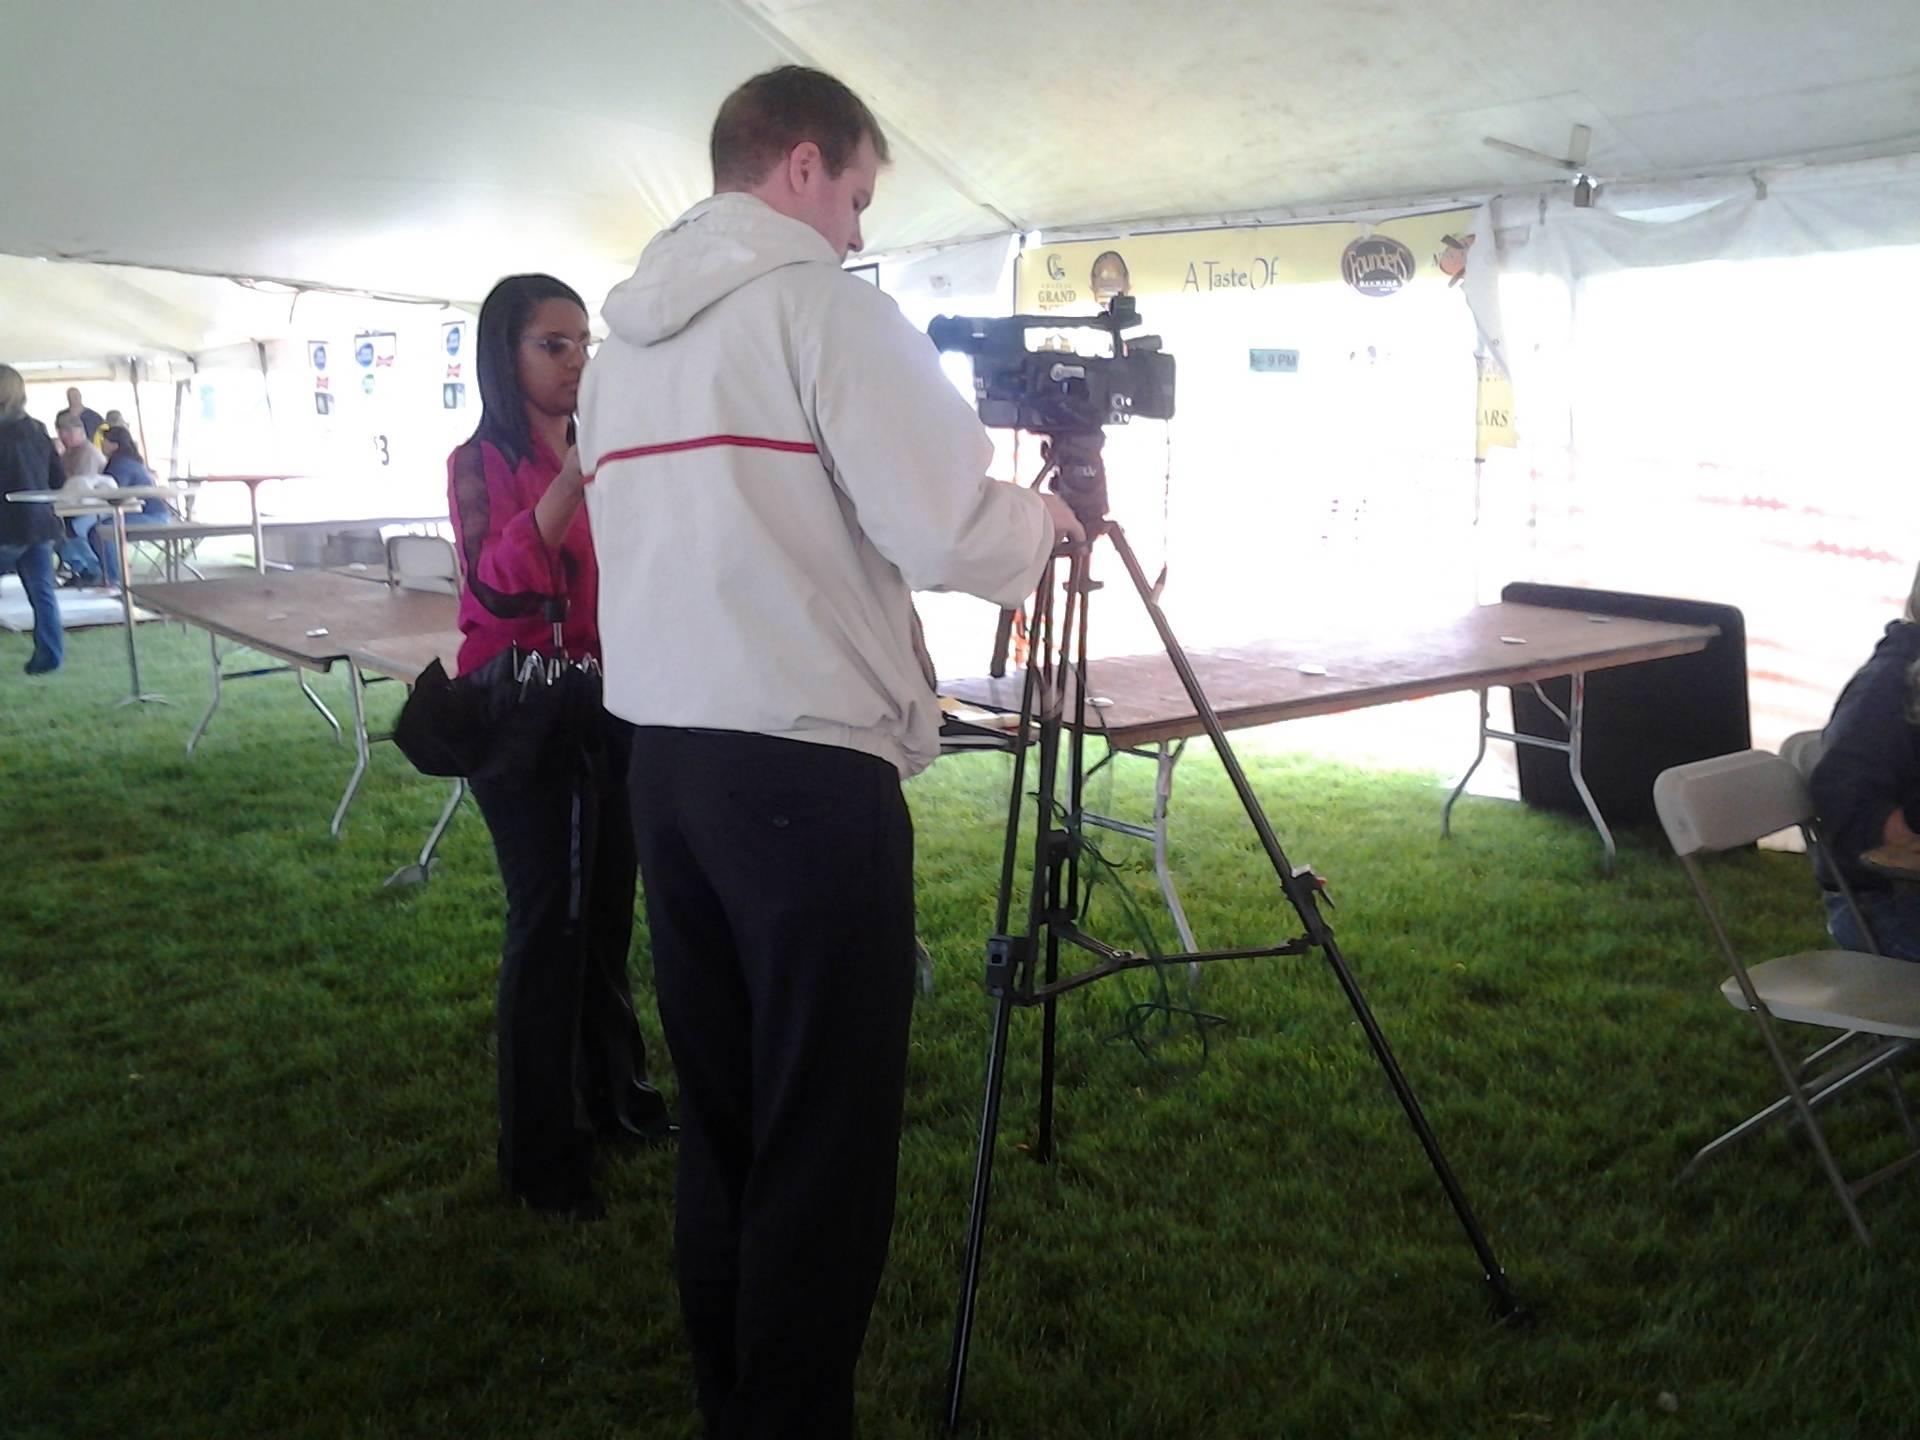 Another TV crew